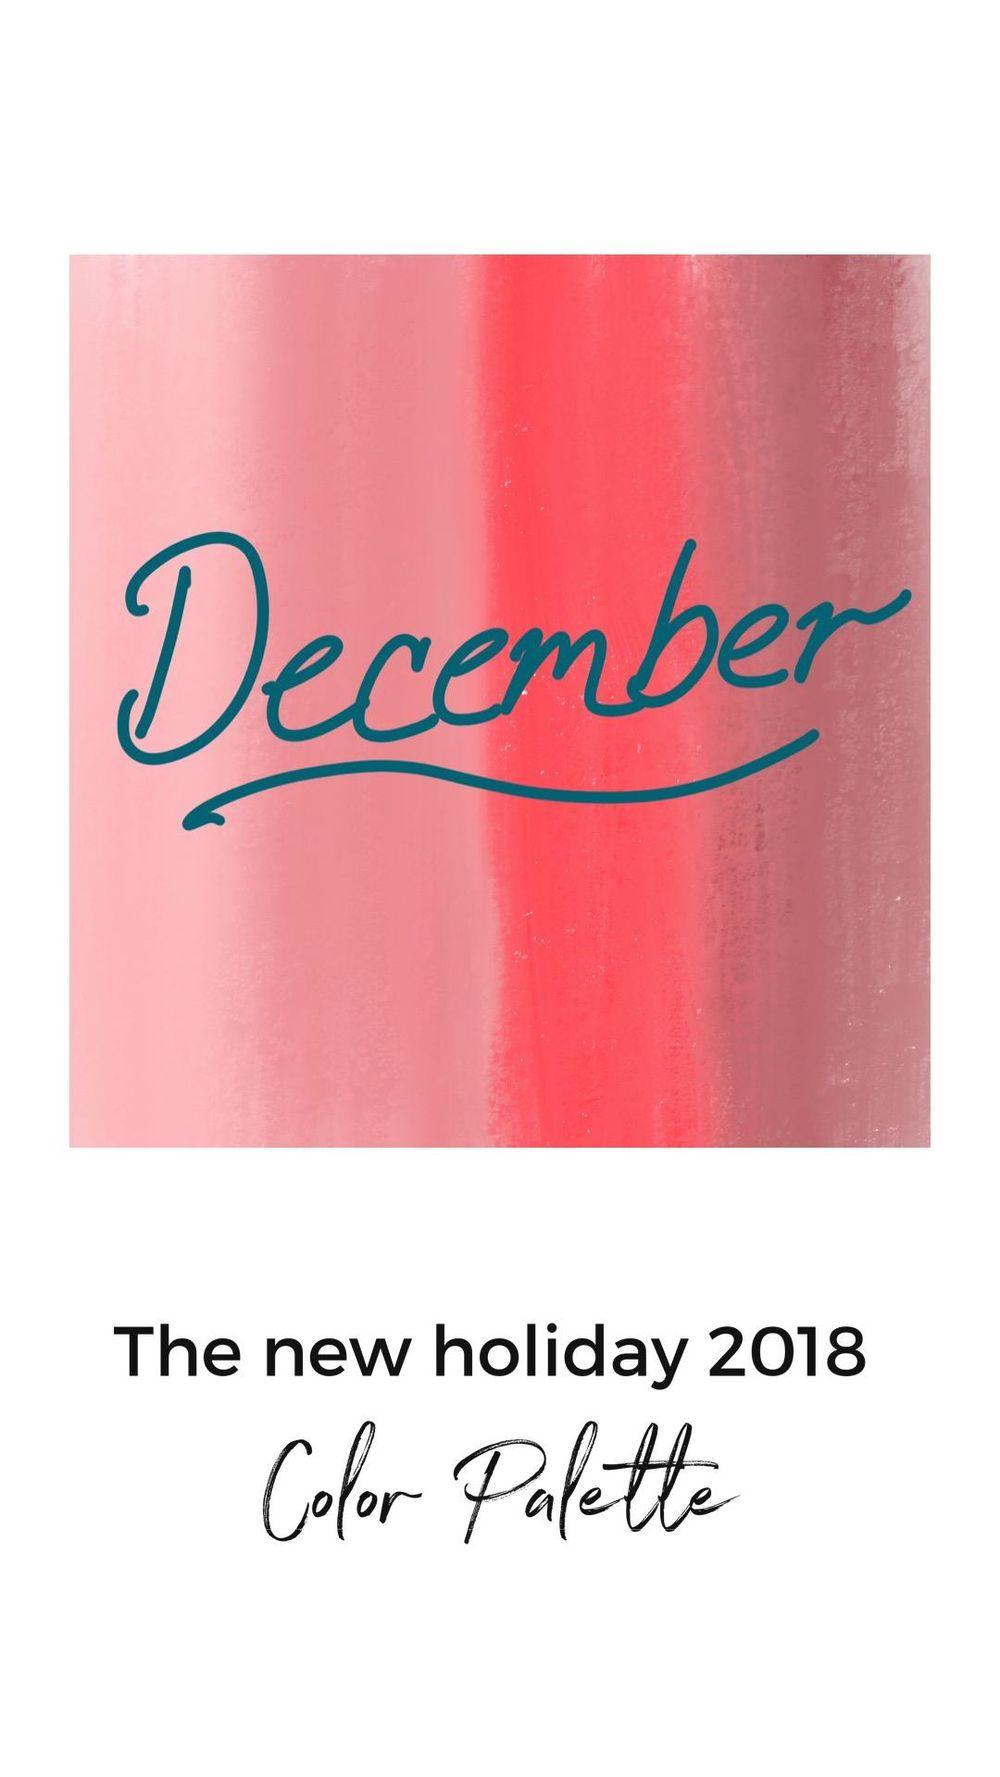 New December Color Palette - image 2 - student project